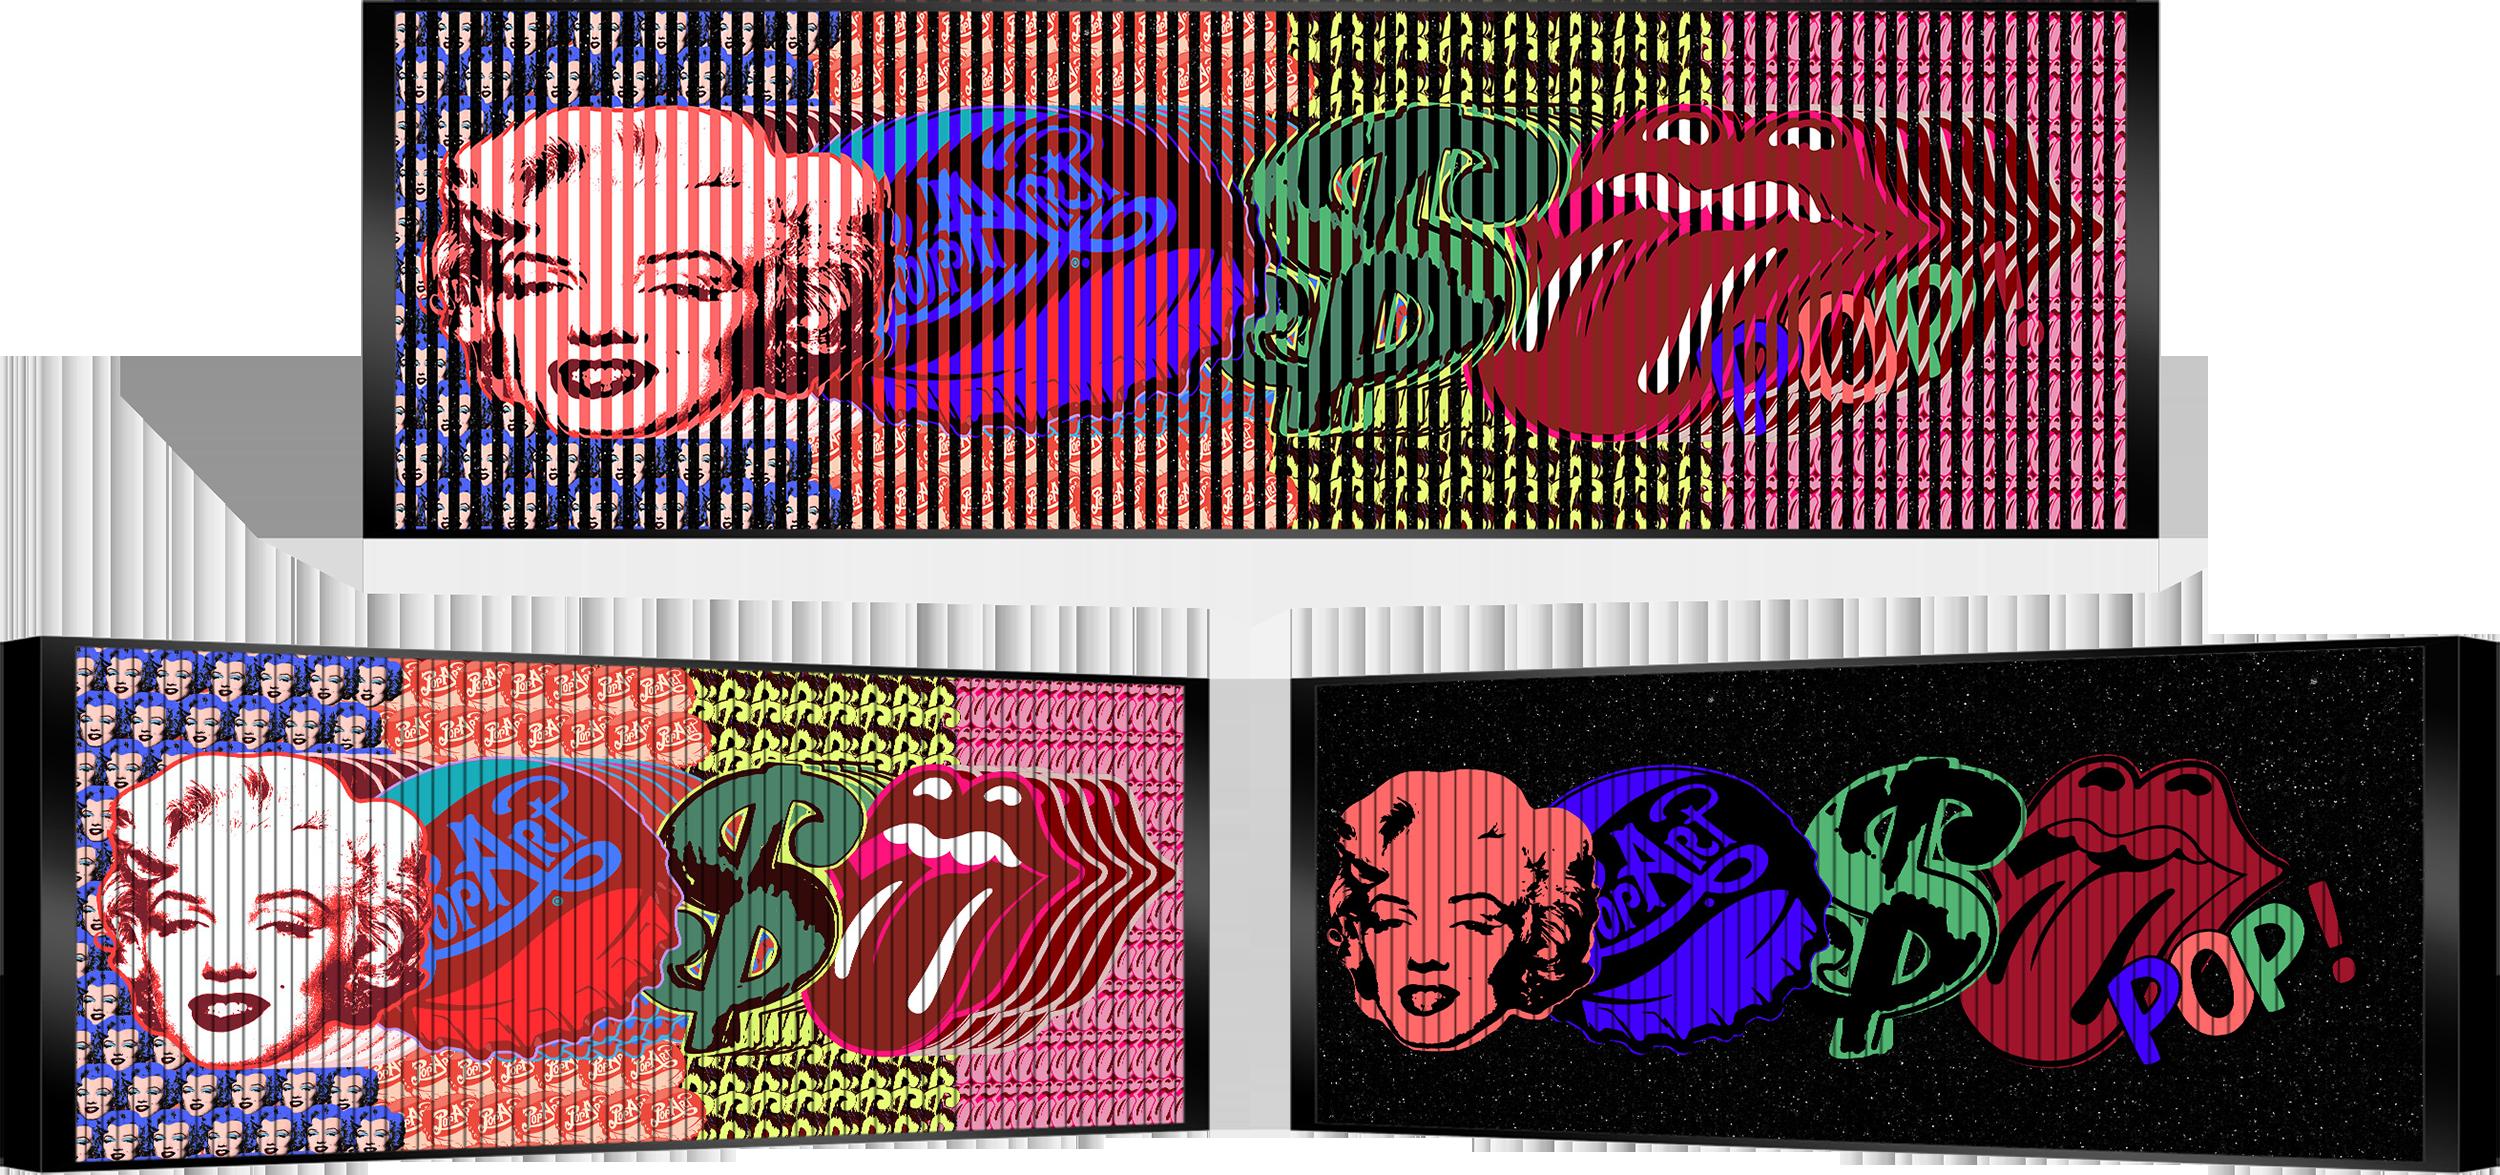 Patrick Rubinstein - Une icône, une langue, du flouze , 2624-012-223